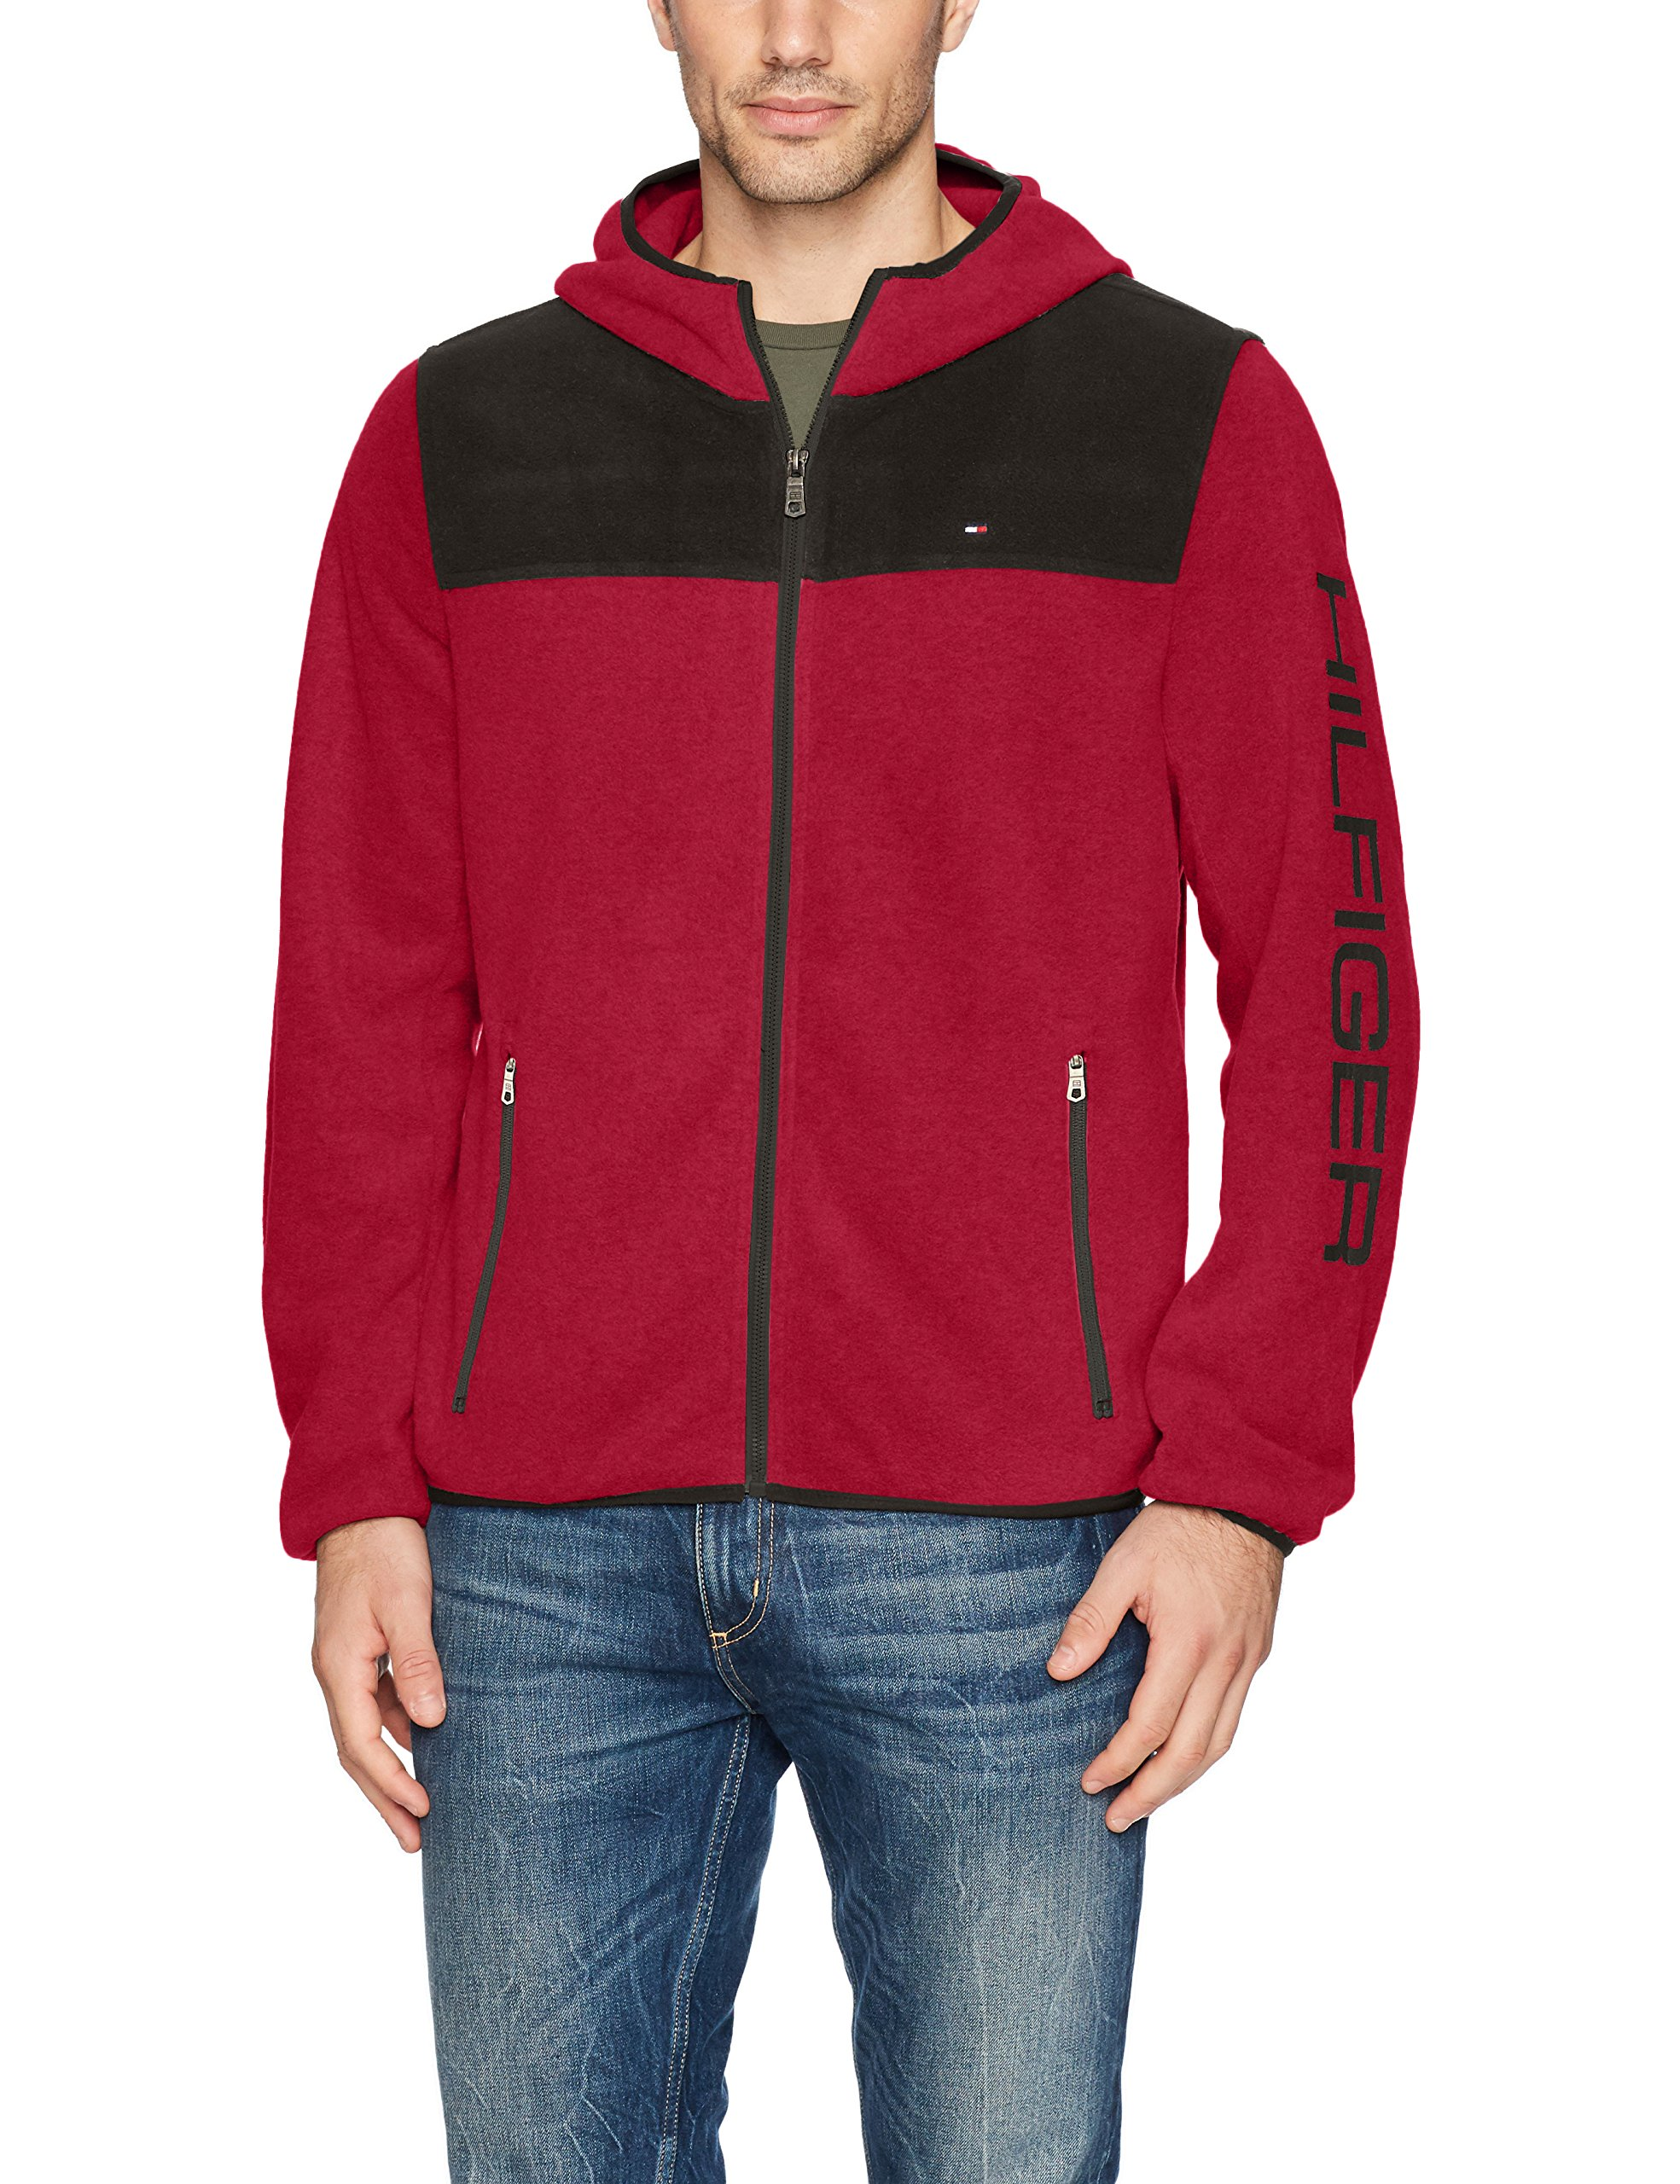 Tommy Hilfiger Men's Hooded Performance Fleece Jacket, Black/Red, Large by Tommy Hilfiger